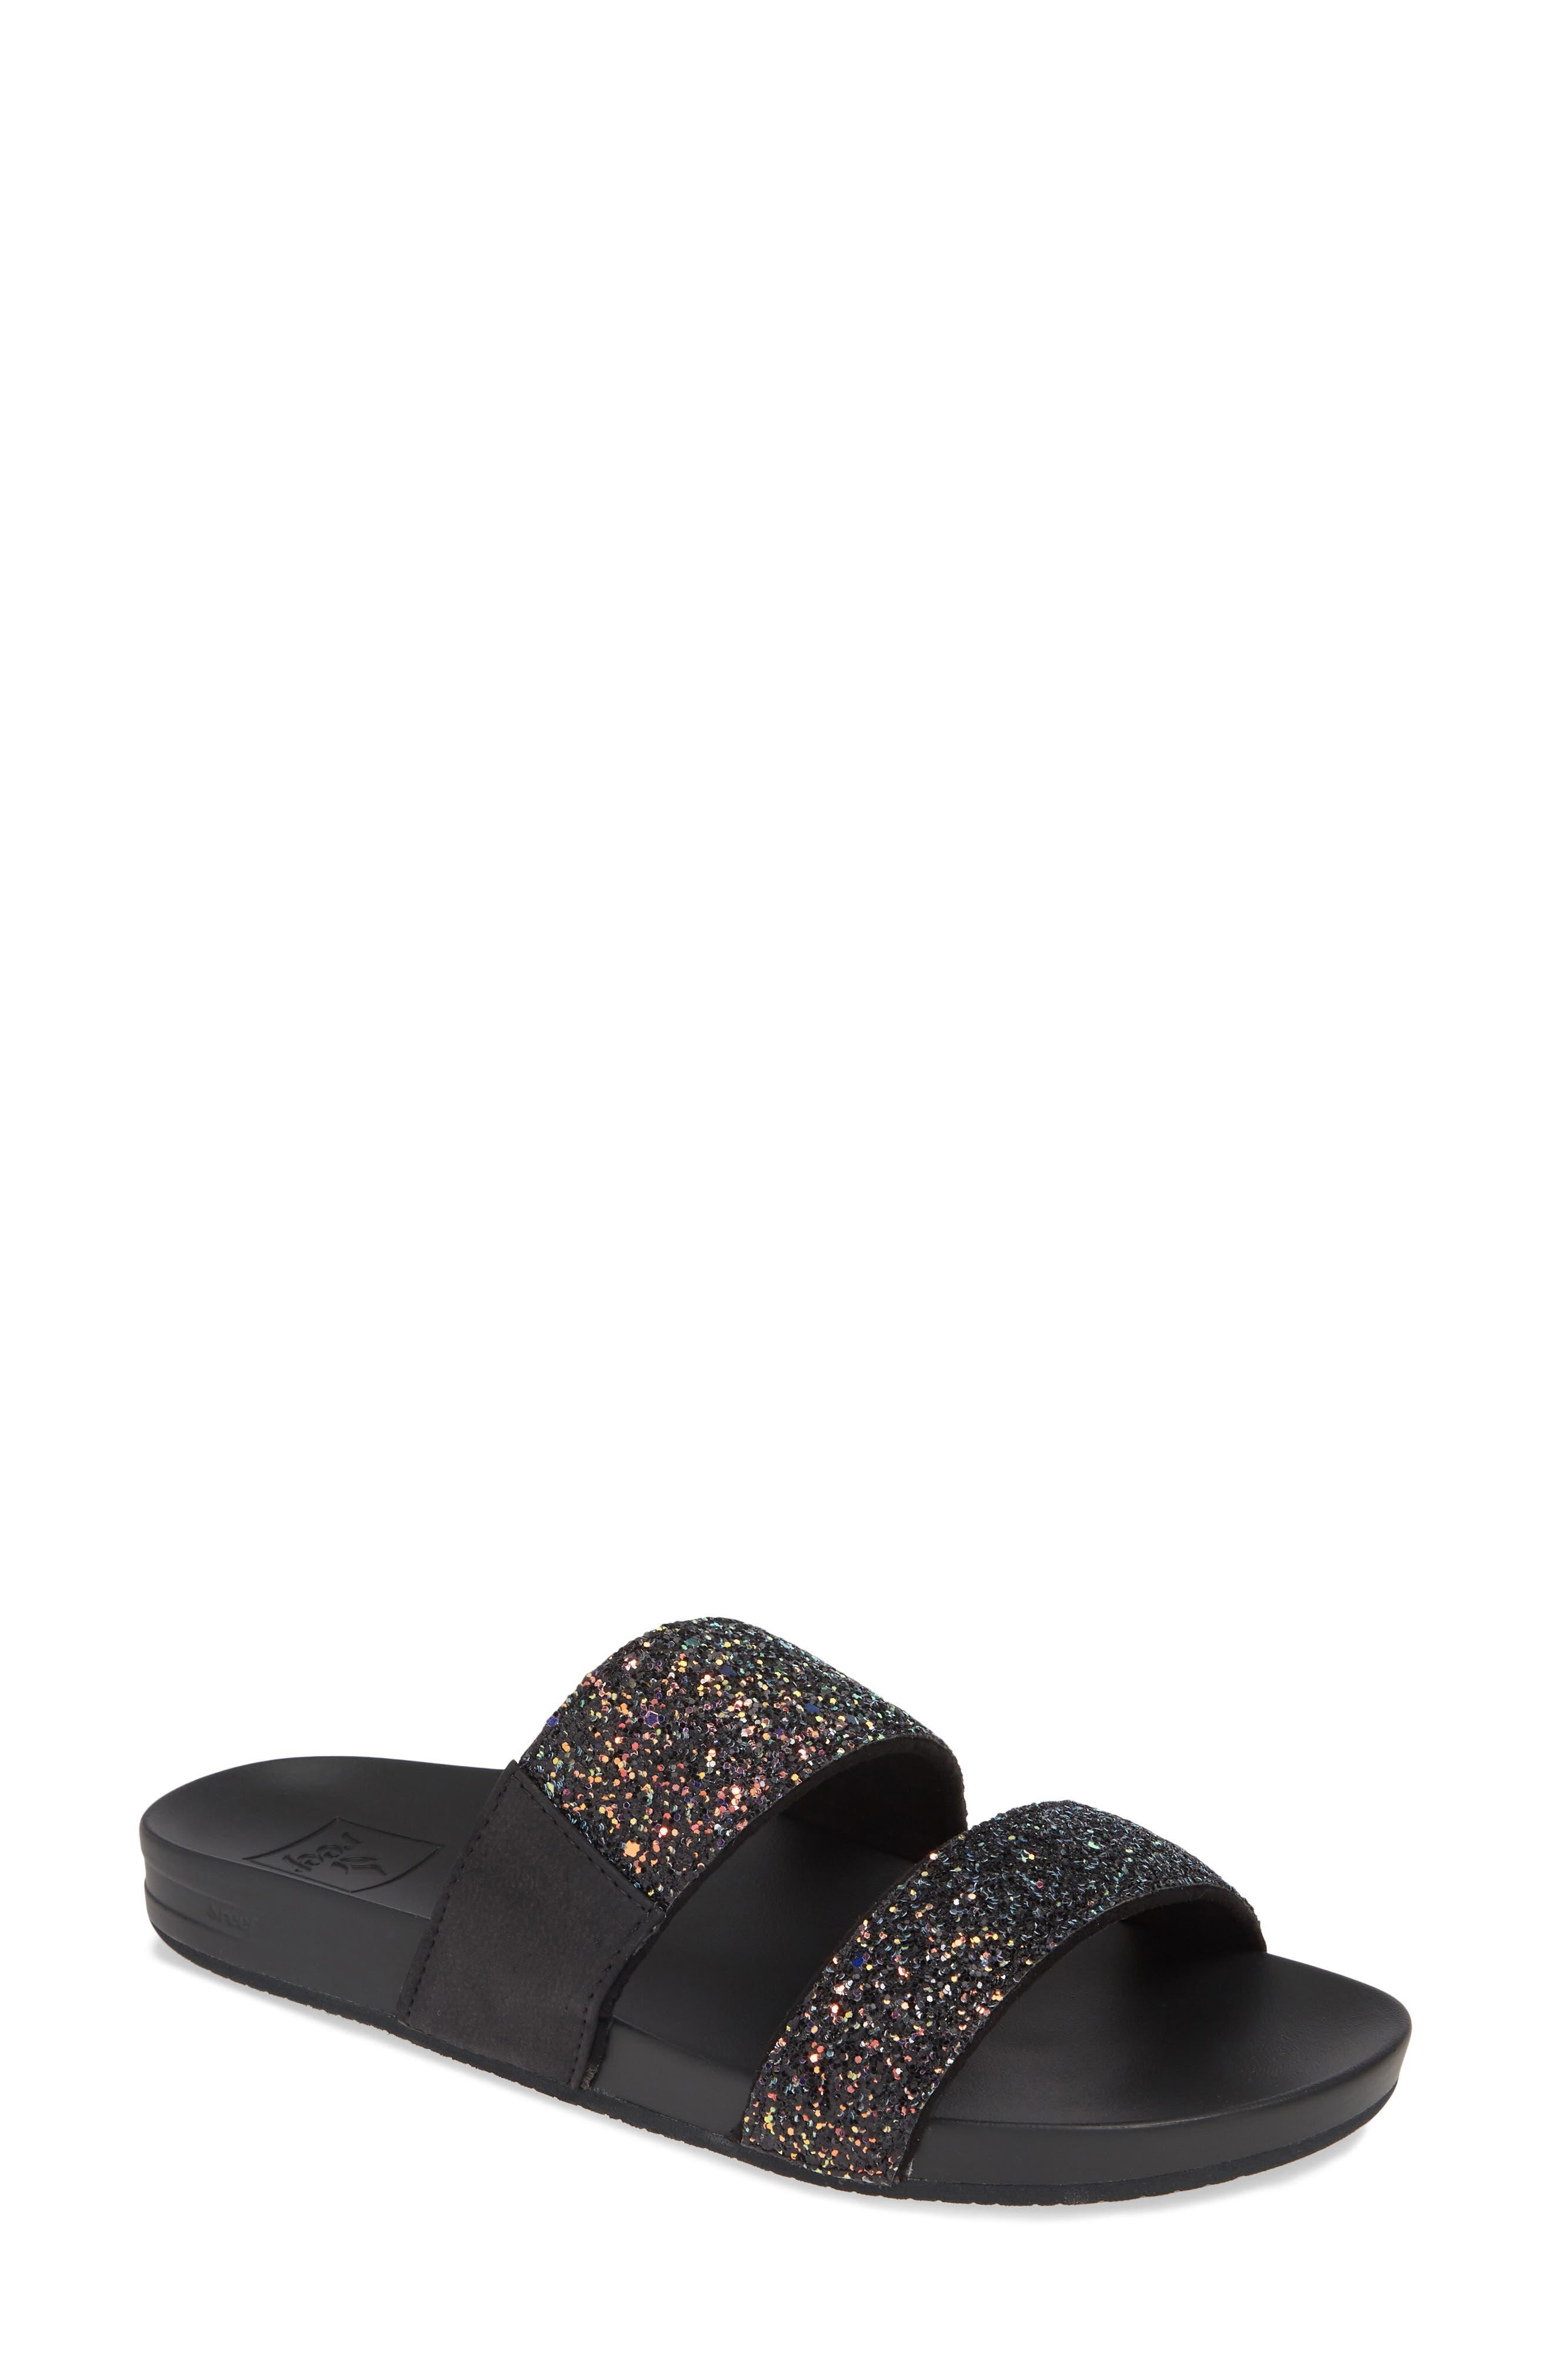 ,                             Cushion Bounce Vista Slide Sandal,                             Main thumbnail 1, color,                             POP ROCKS